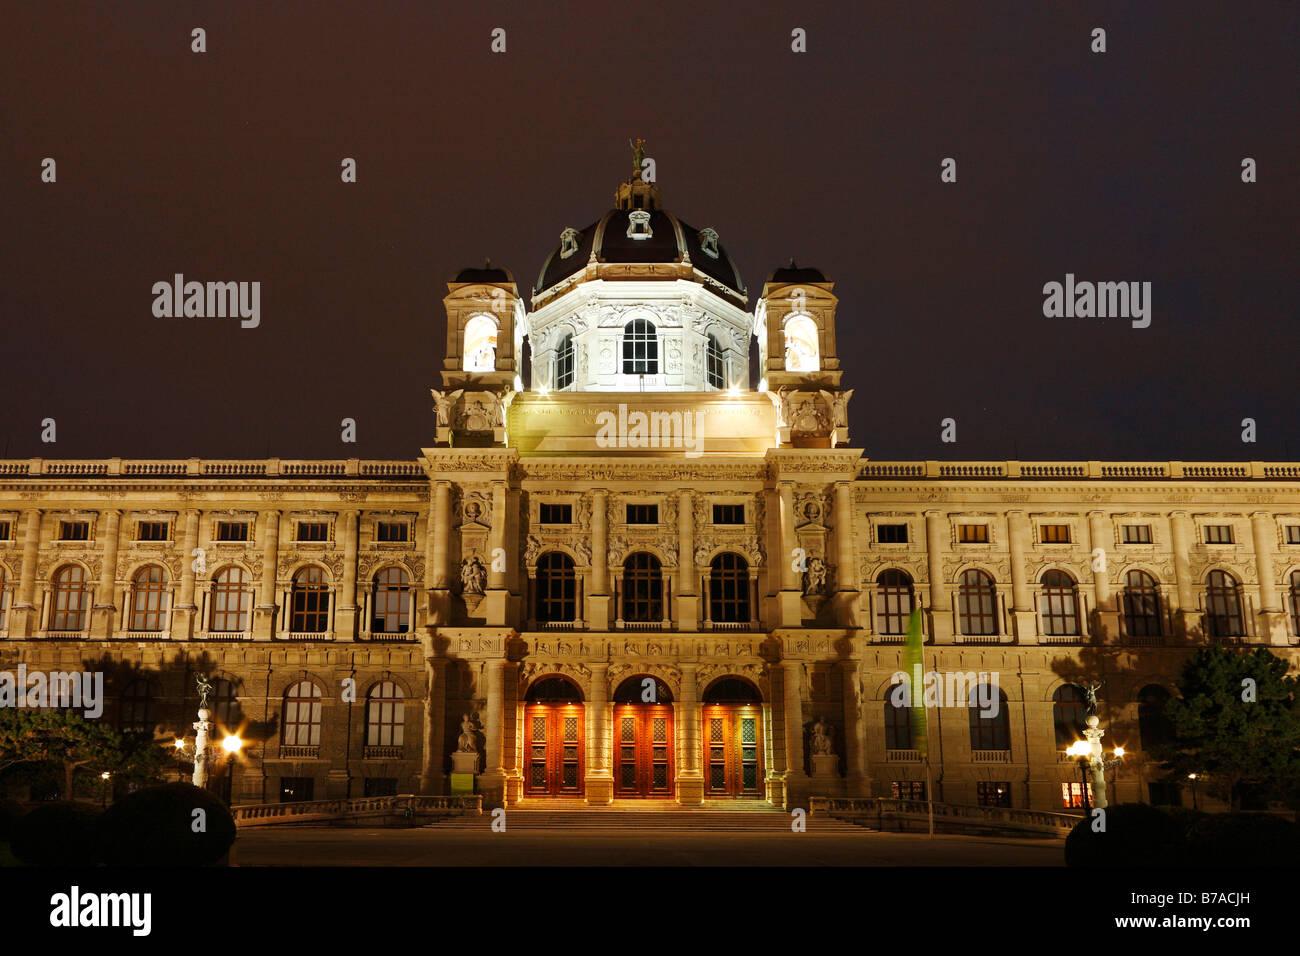 Museum of Art History, Kunsthistorisches Museum, Maria-Theresien-Platz, Vienna, Austria, Europe Stock Photo